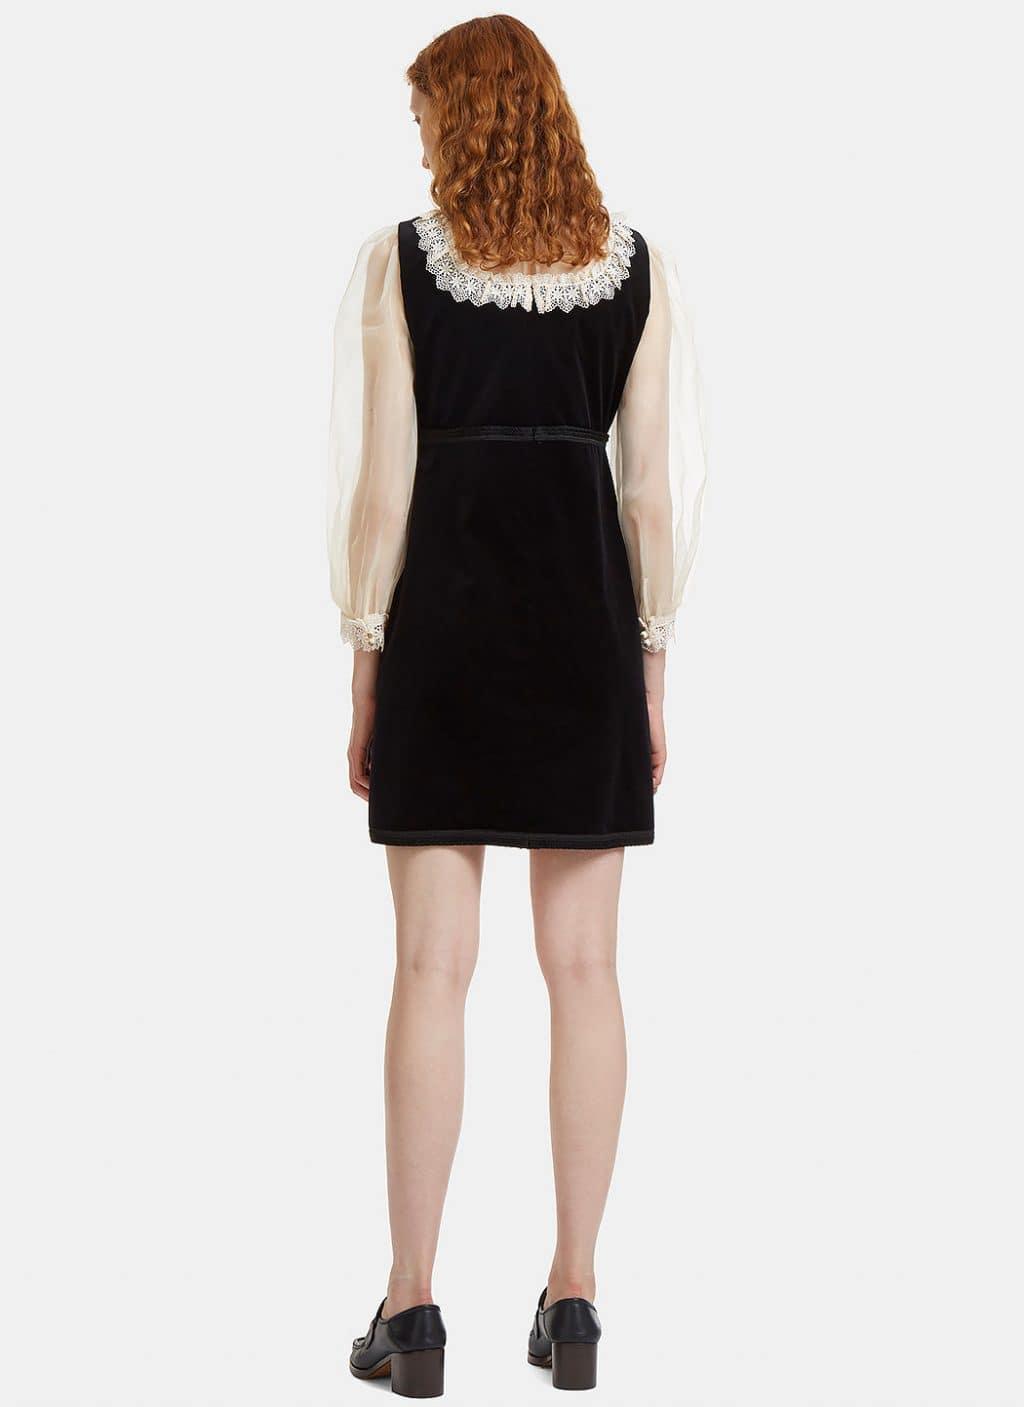 GUCCI Women's Lace-trimmed Pussybow Velvet Black Dress